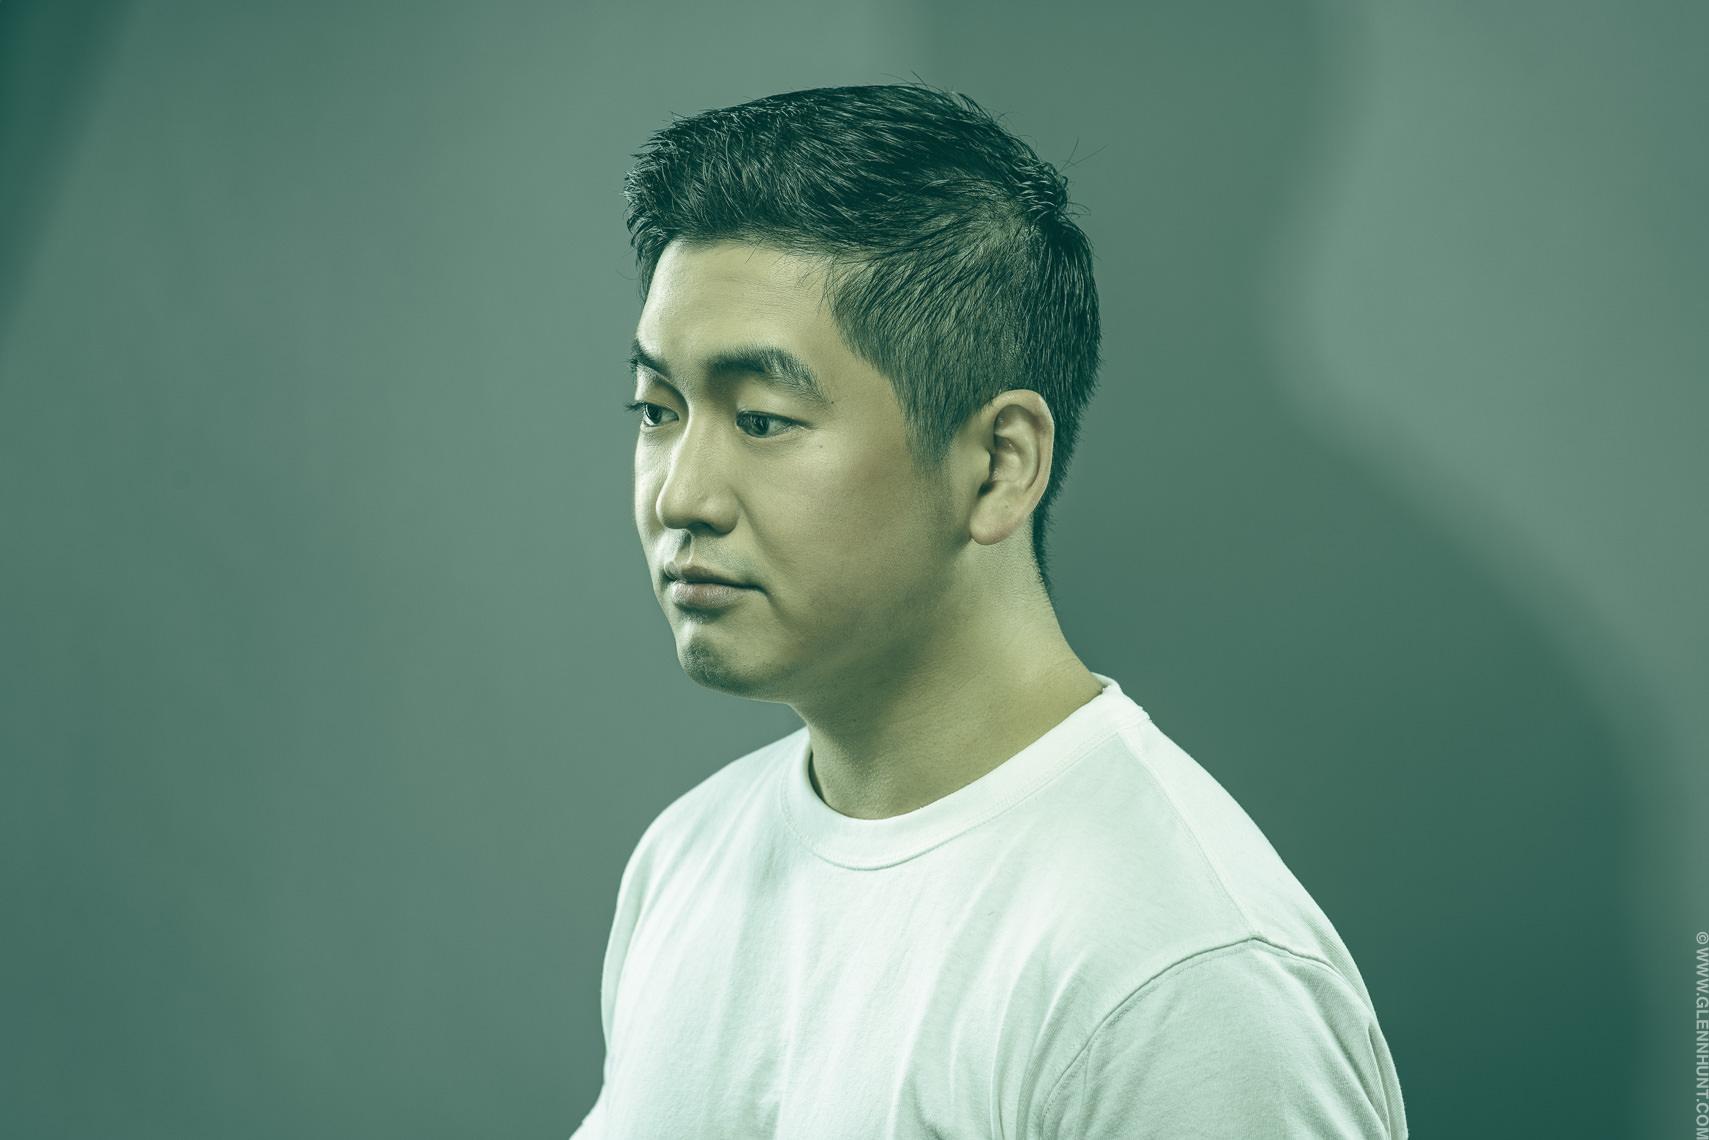 Tenor Kang Wang